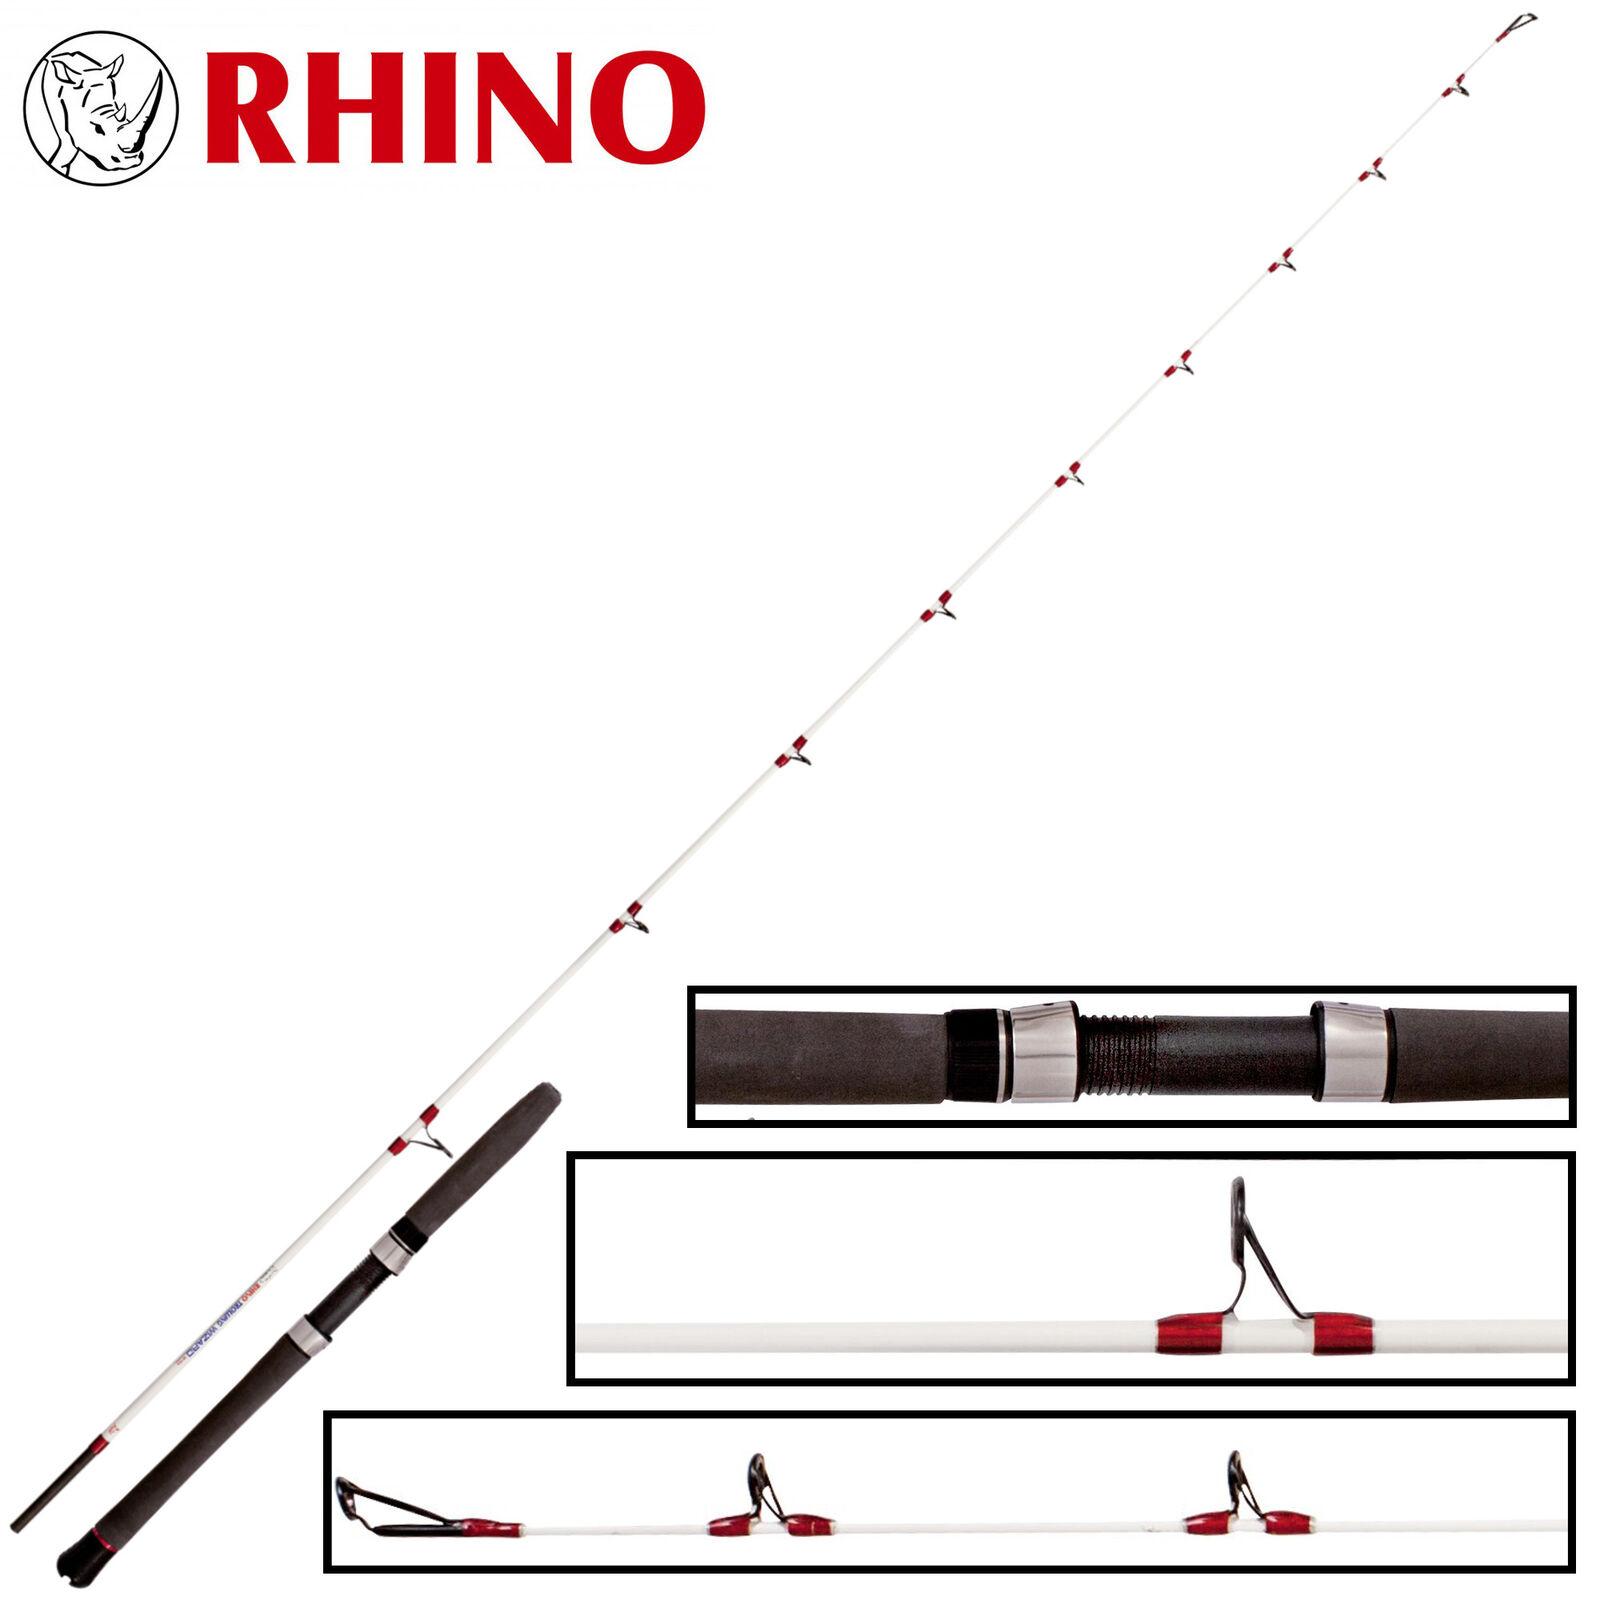 Rhino Trolling Wizard 2 10m 30-70g - Schlepprute Schlepprute Schlepprute Trollingrute für Lachs 6cafae